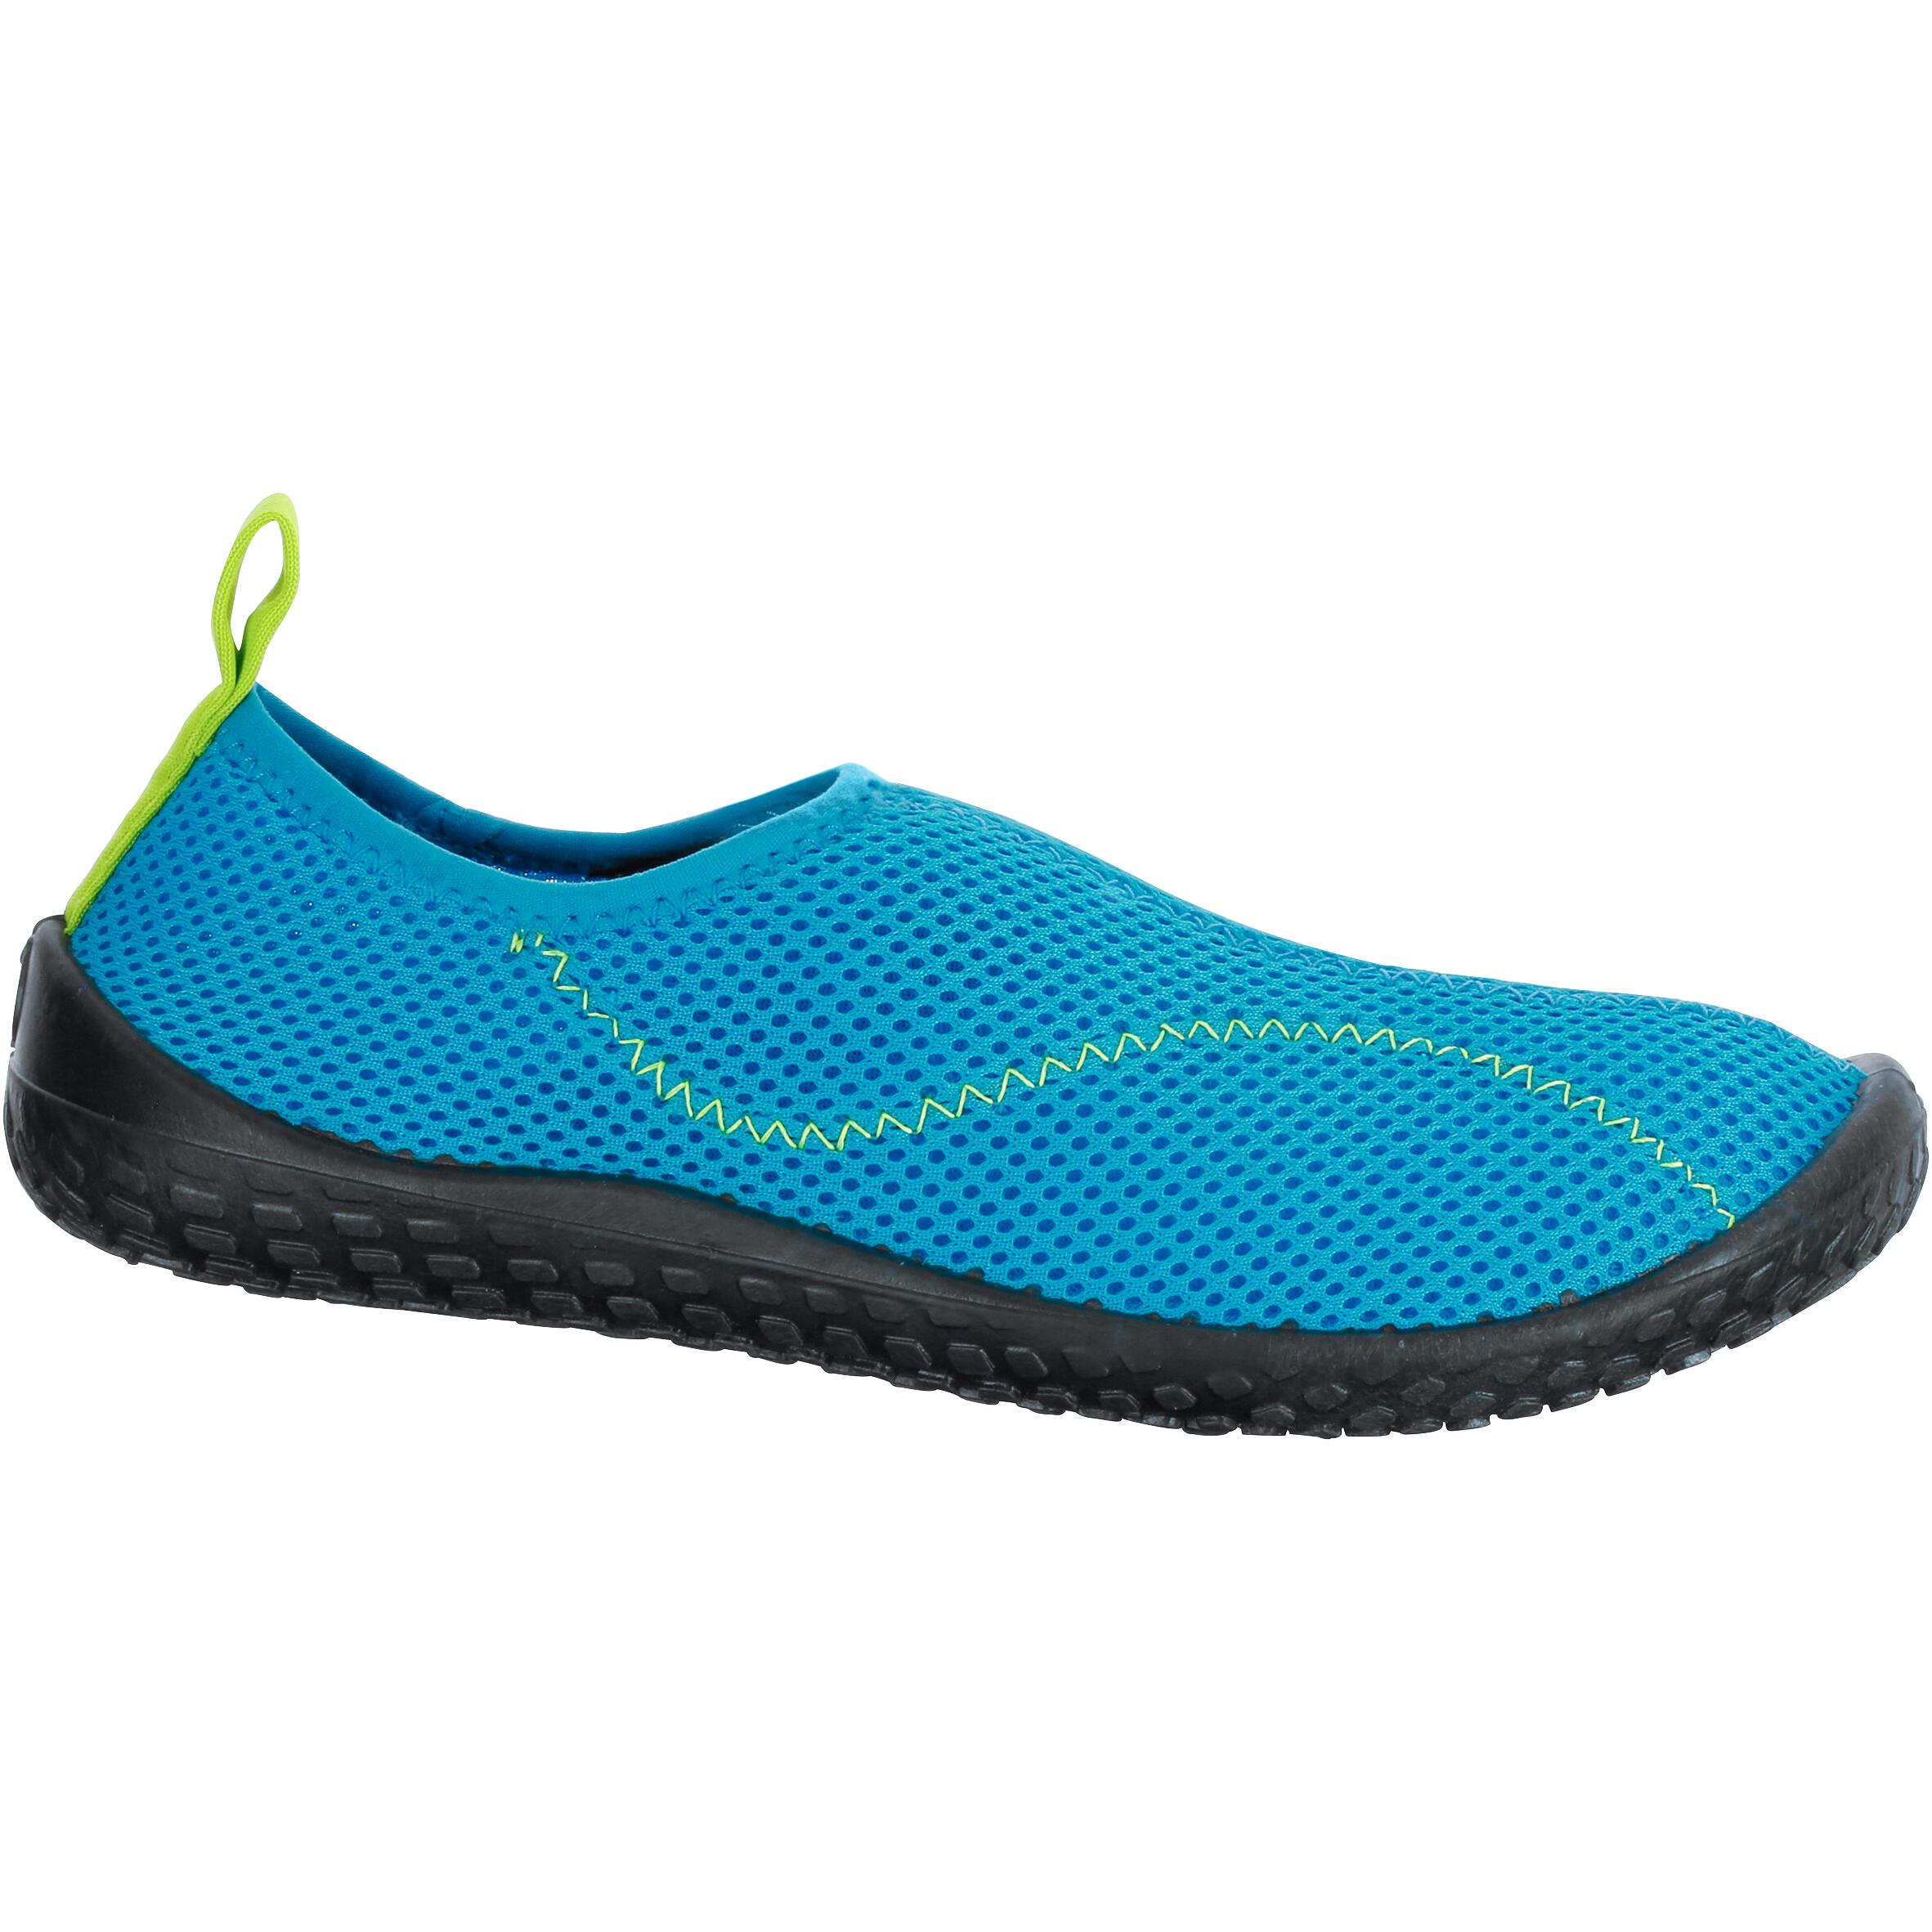 Aquashoes, water shoes